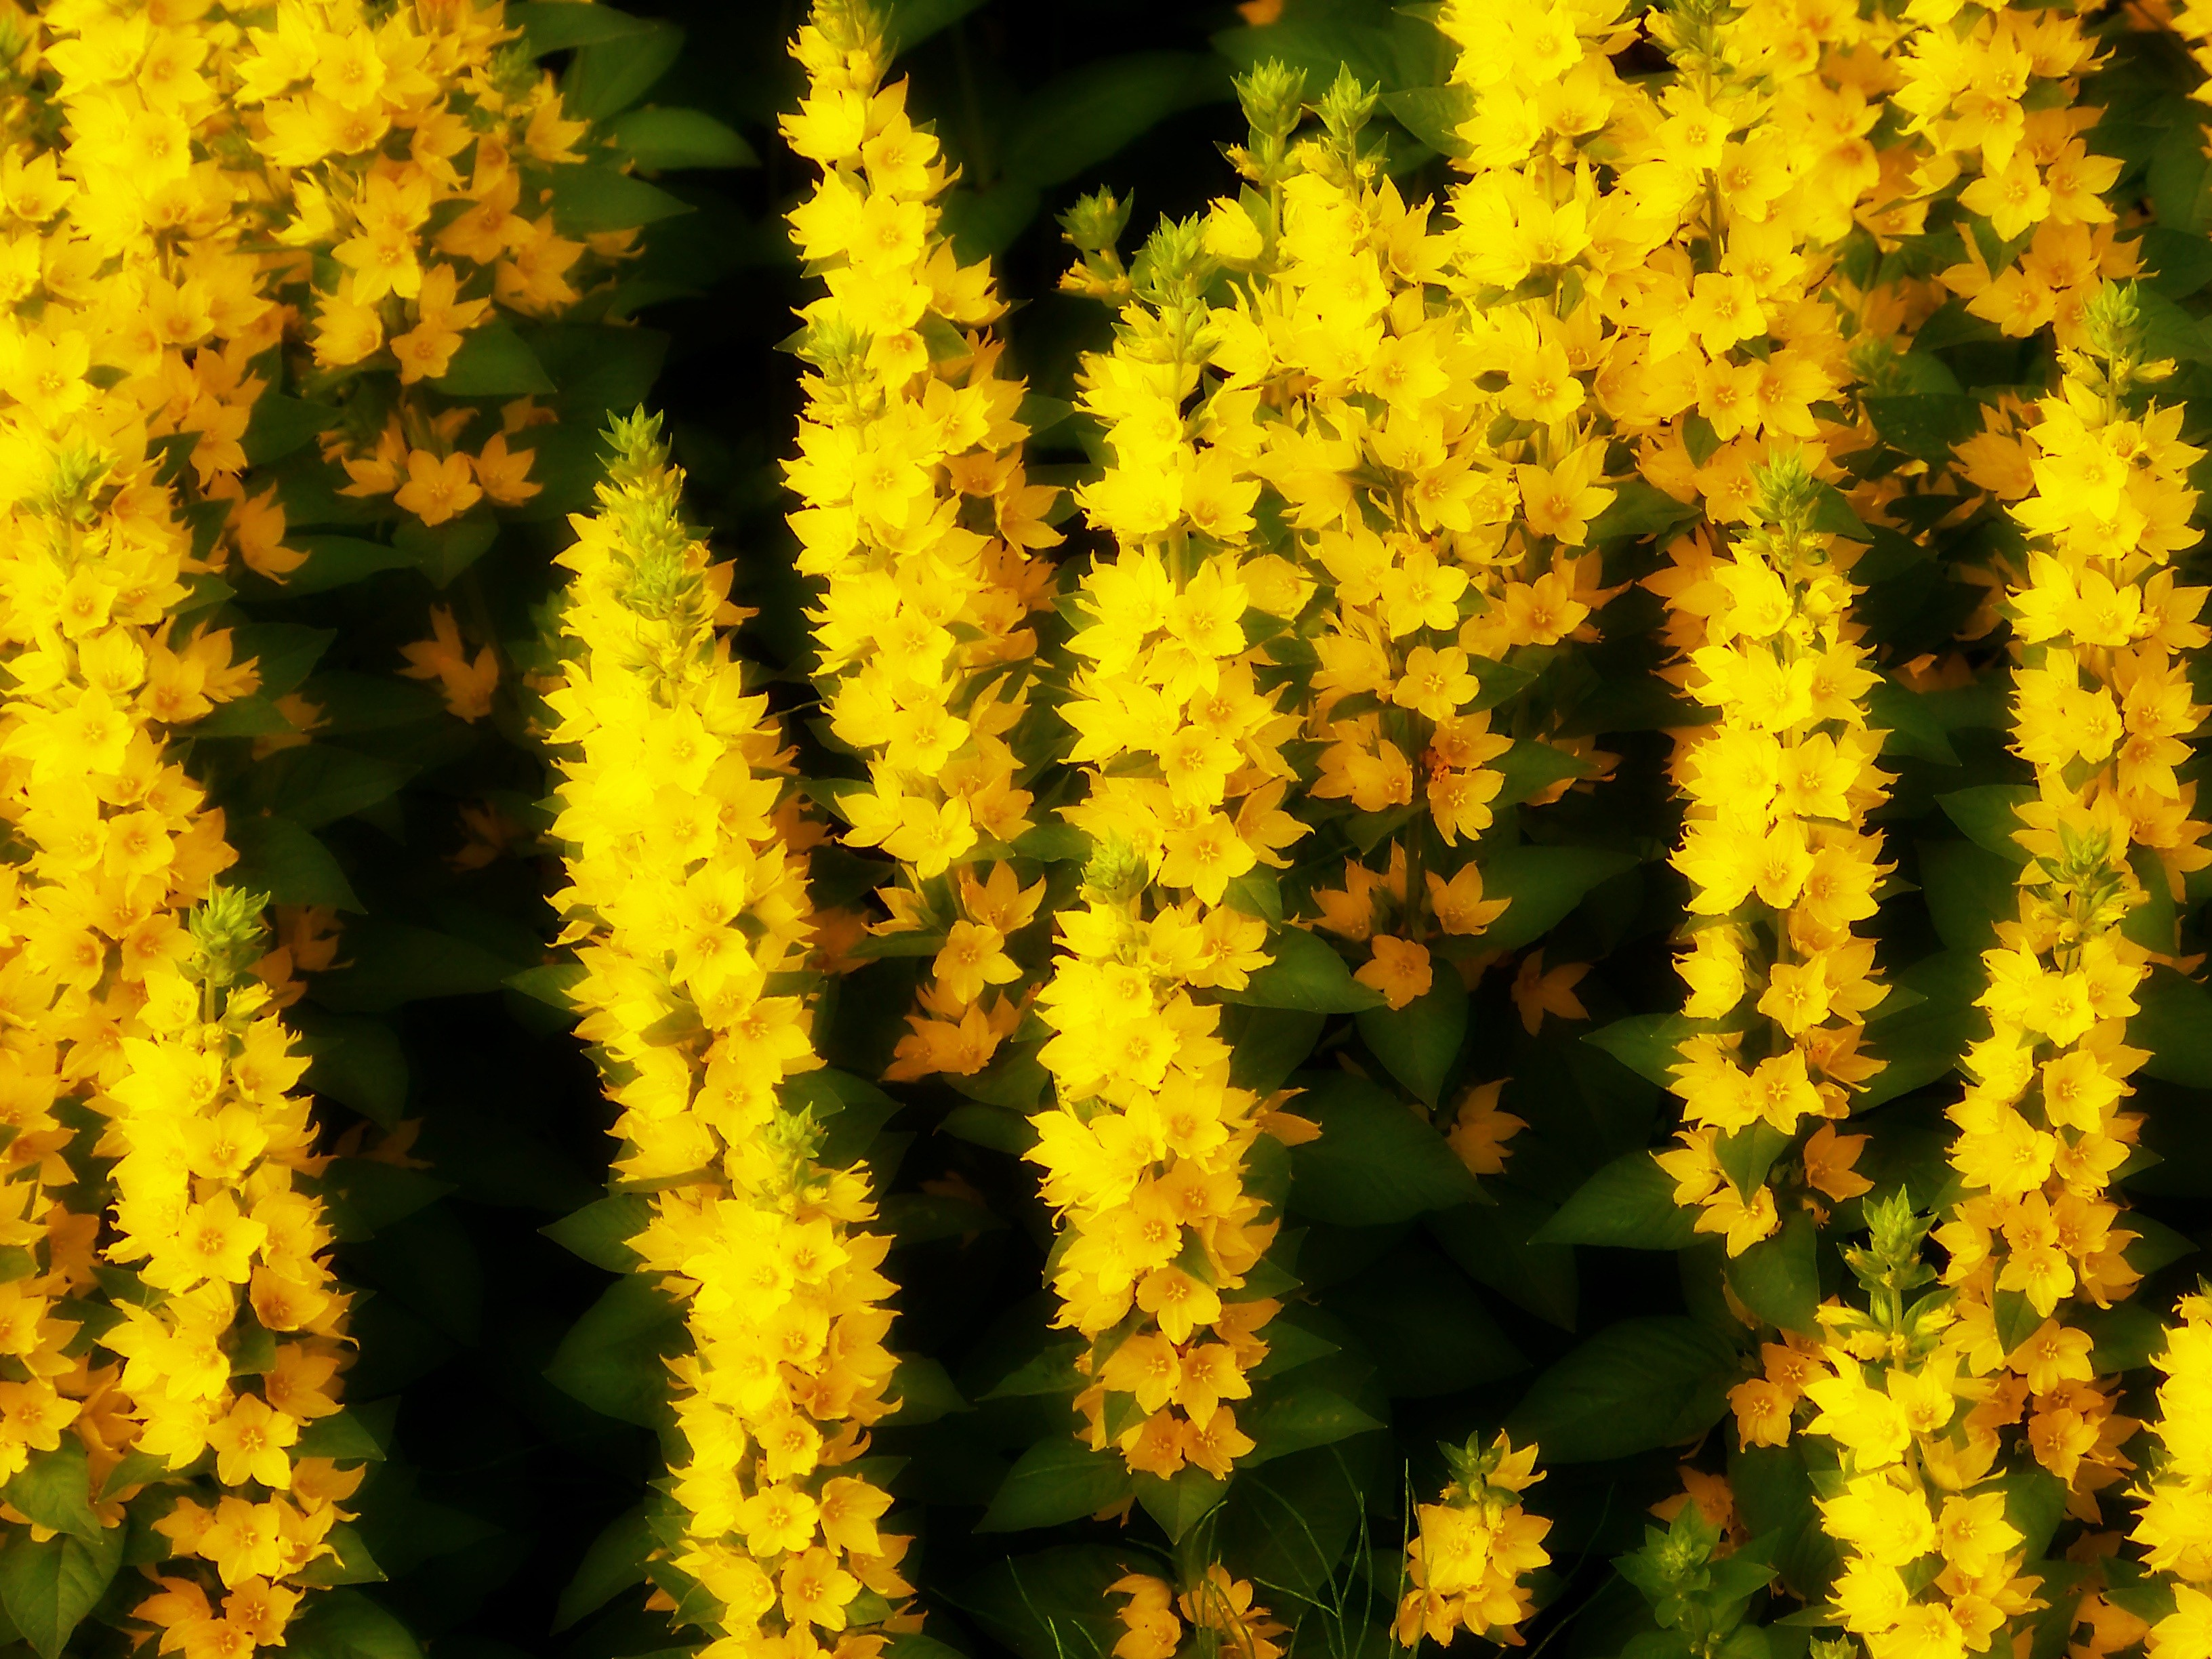 General 3264x2448 flowers plants yellow flowers